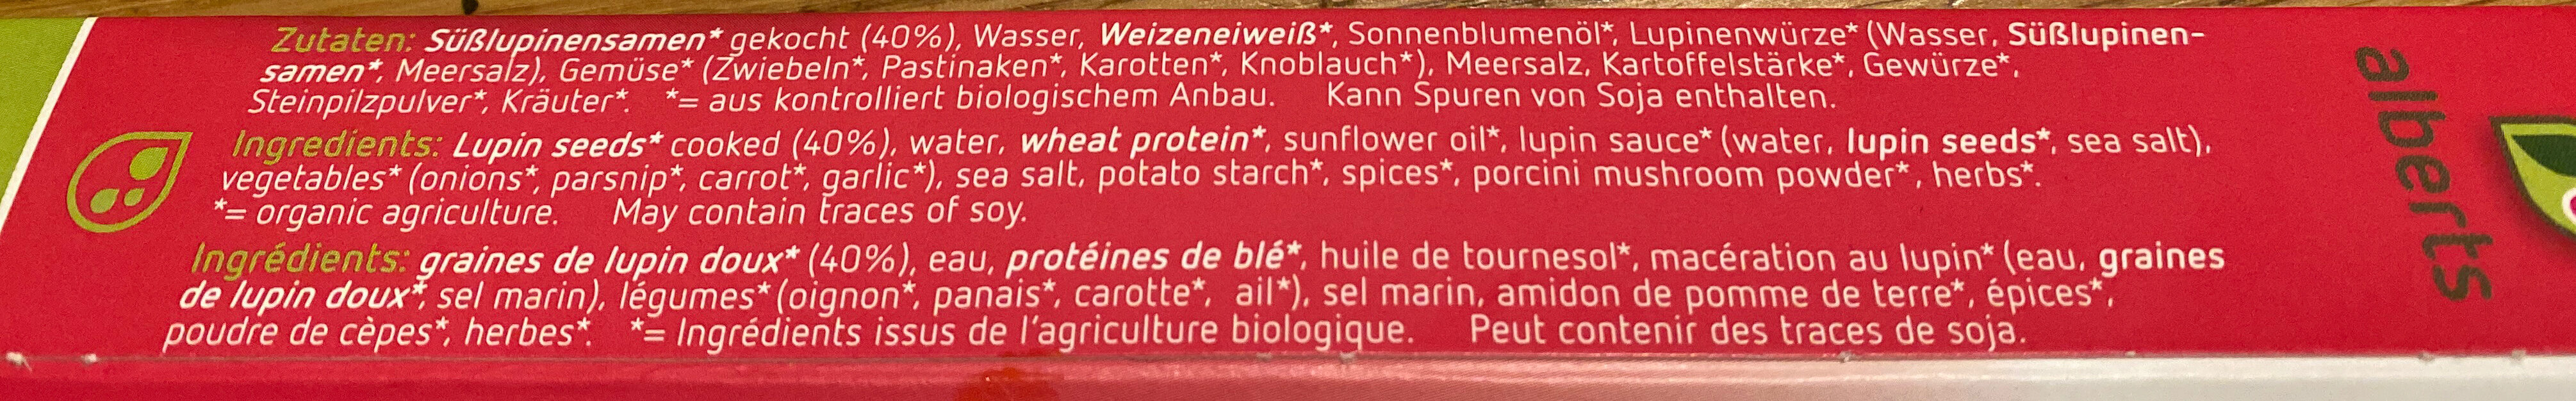 Filet De Lupin - Ingredients - en